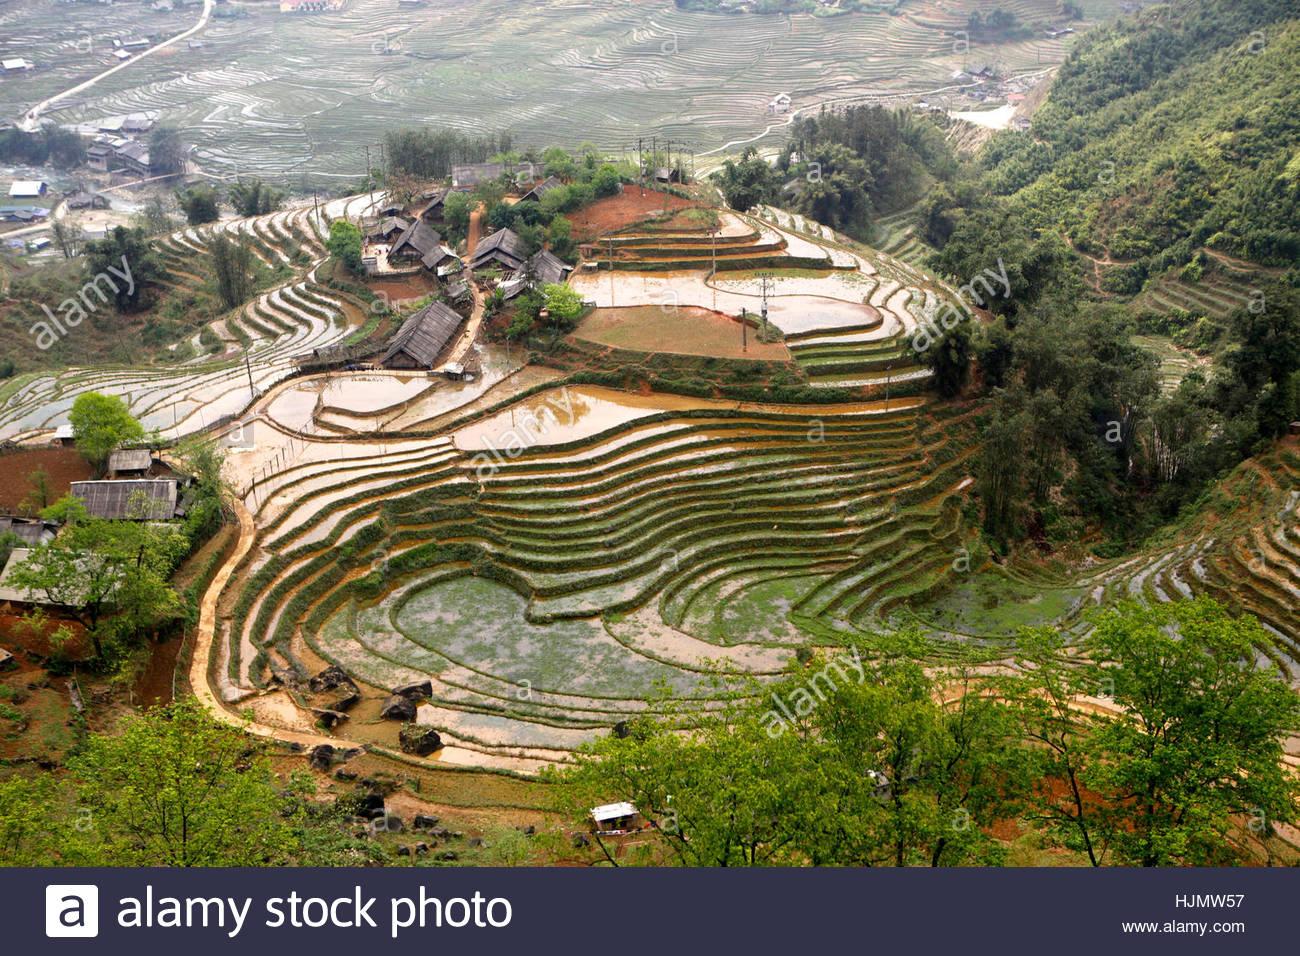 Terraced rice paddies in Sapa, Vietnam. - Stock Image